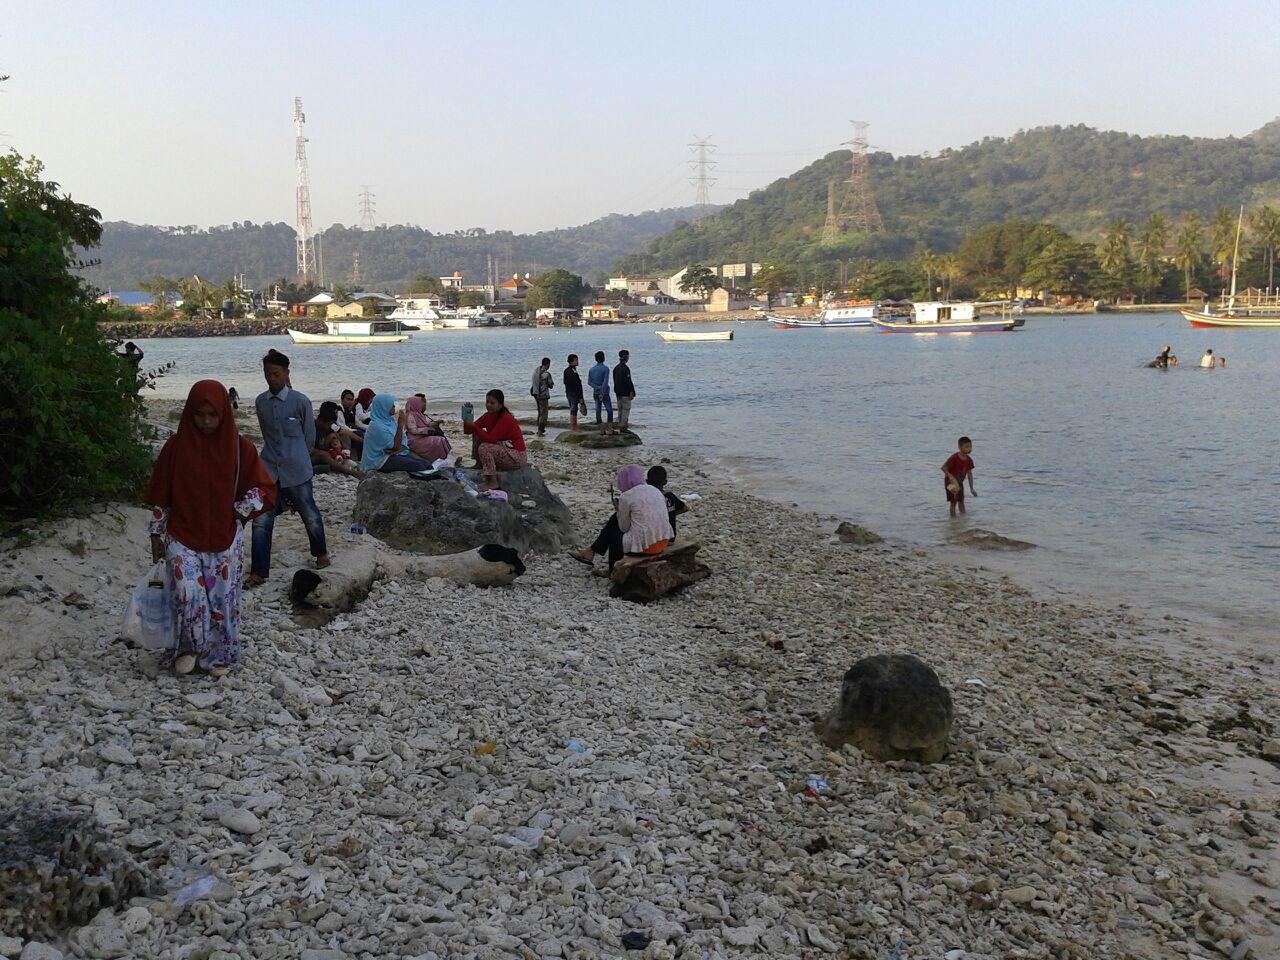 Dirawat Oleh Pemuda Pulau Merak Kecil Makin Ramai Dikunjungi Wisatawan